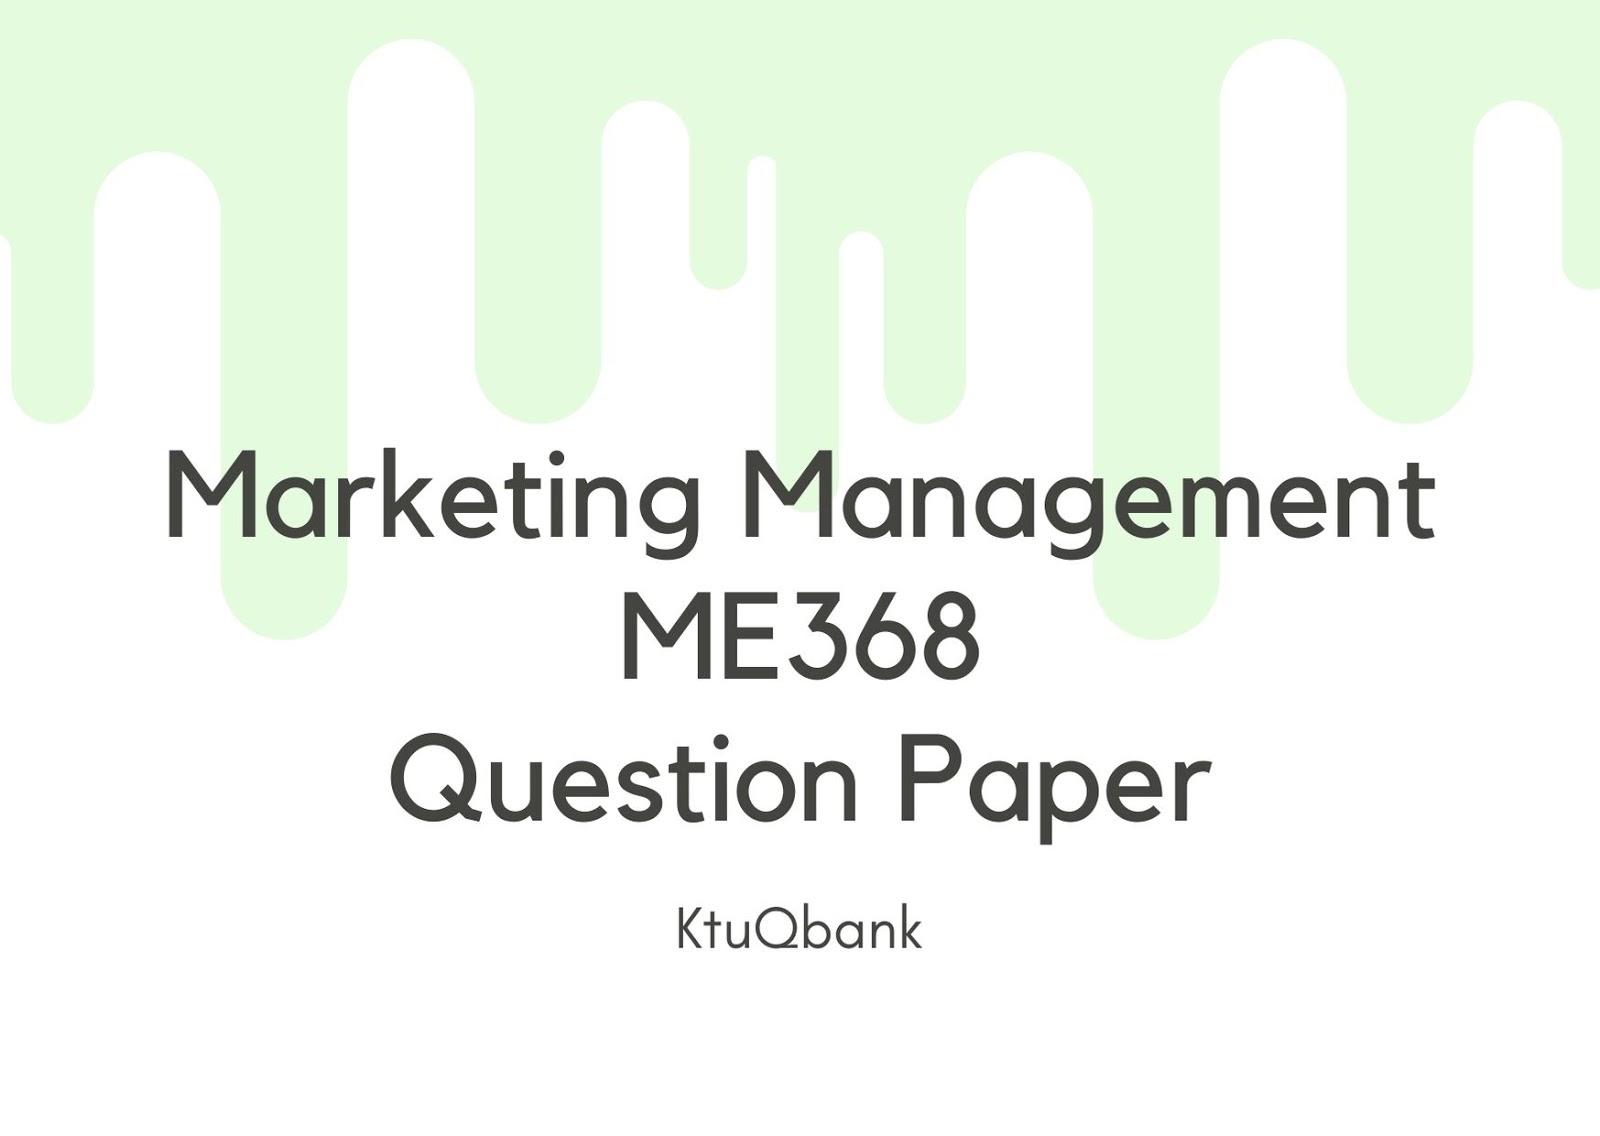 Marketing Management | ME368 | Question Papers (2015 batch)